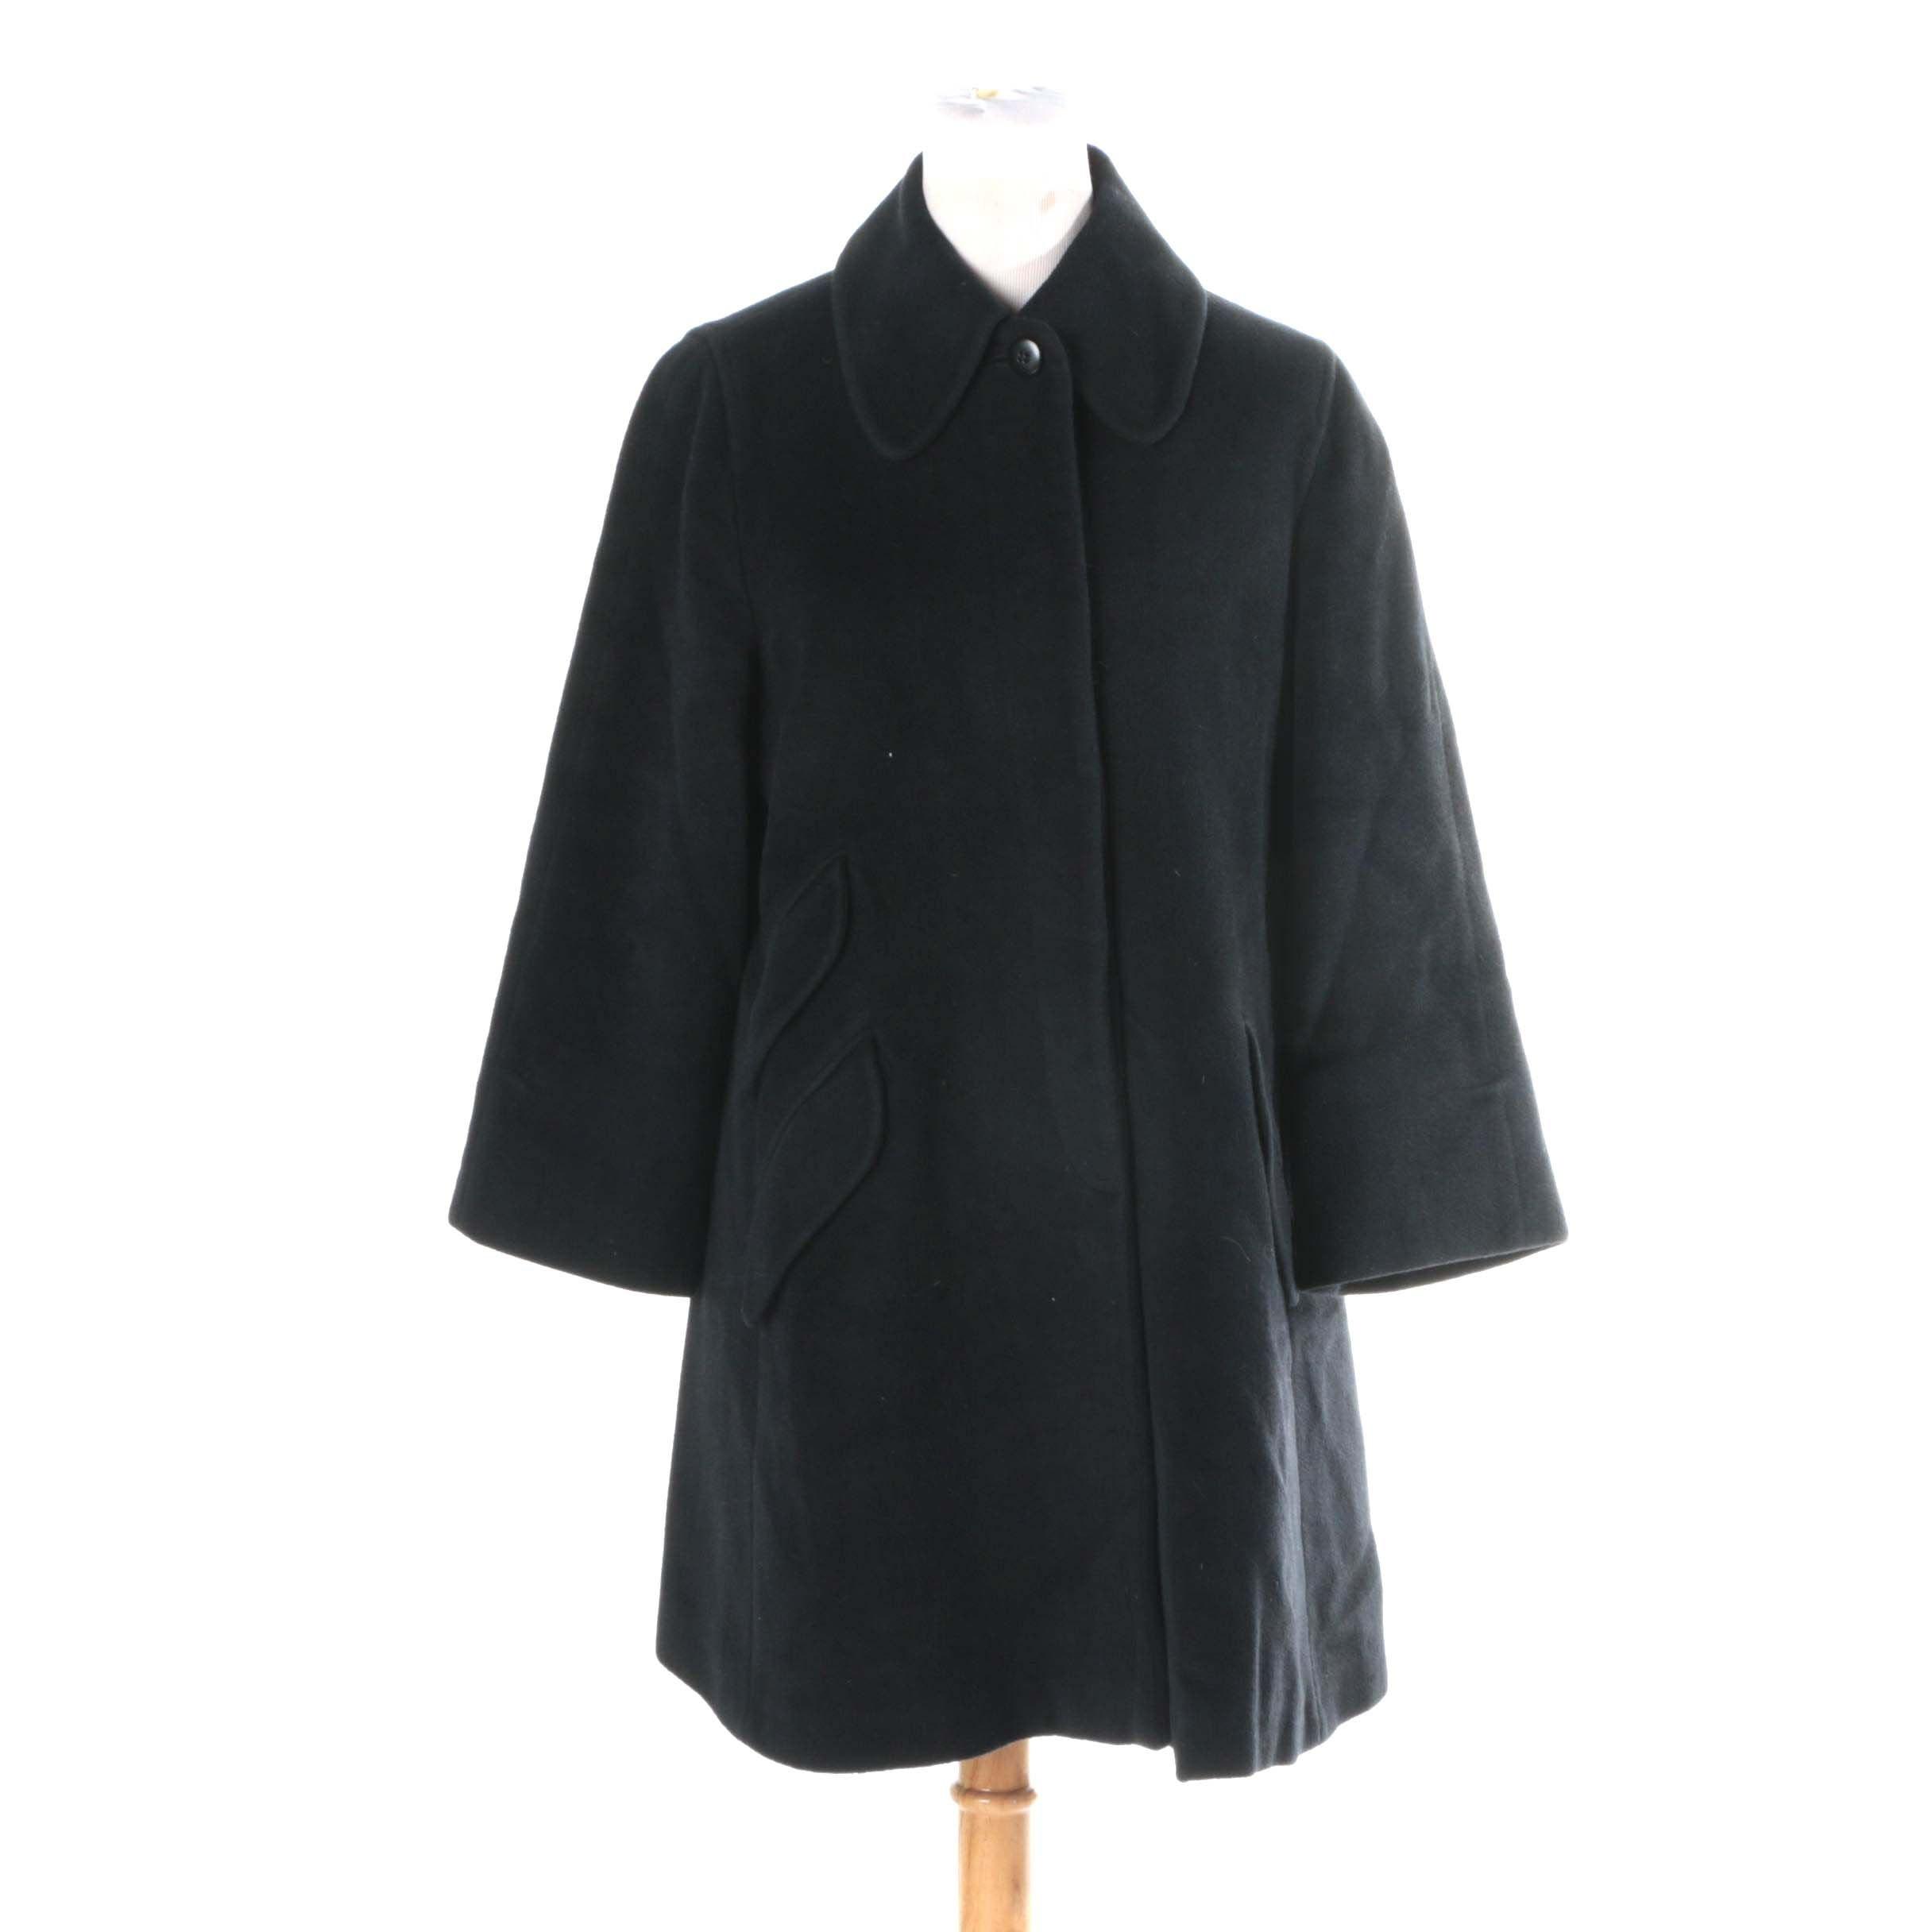 Women's Vintage Armani Black Swing Coat